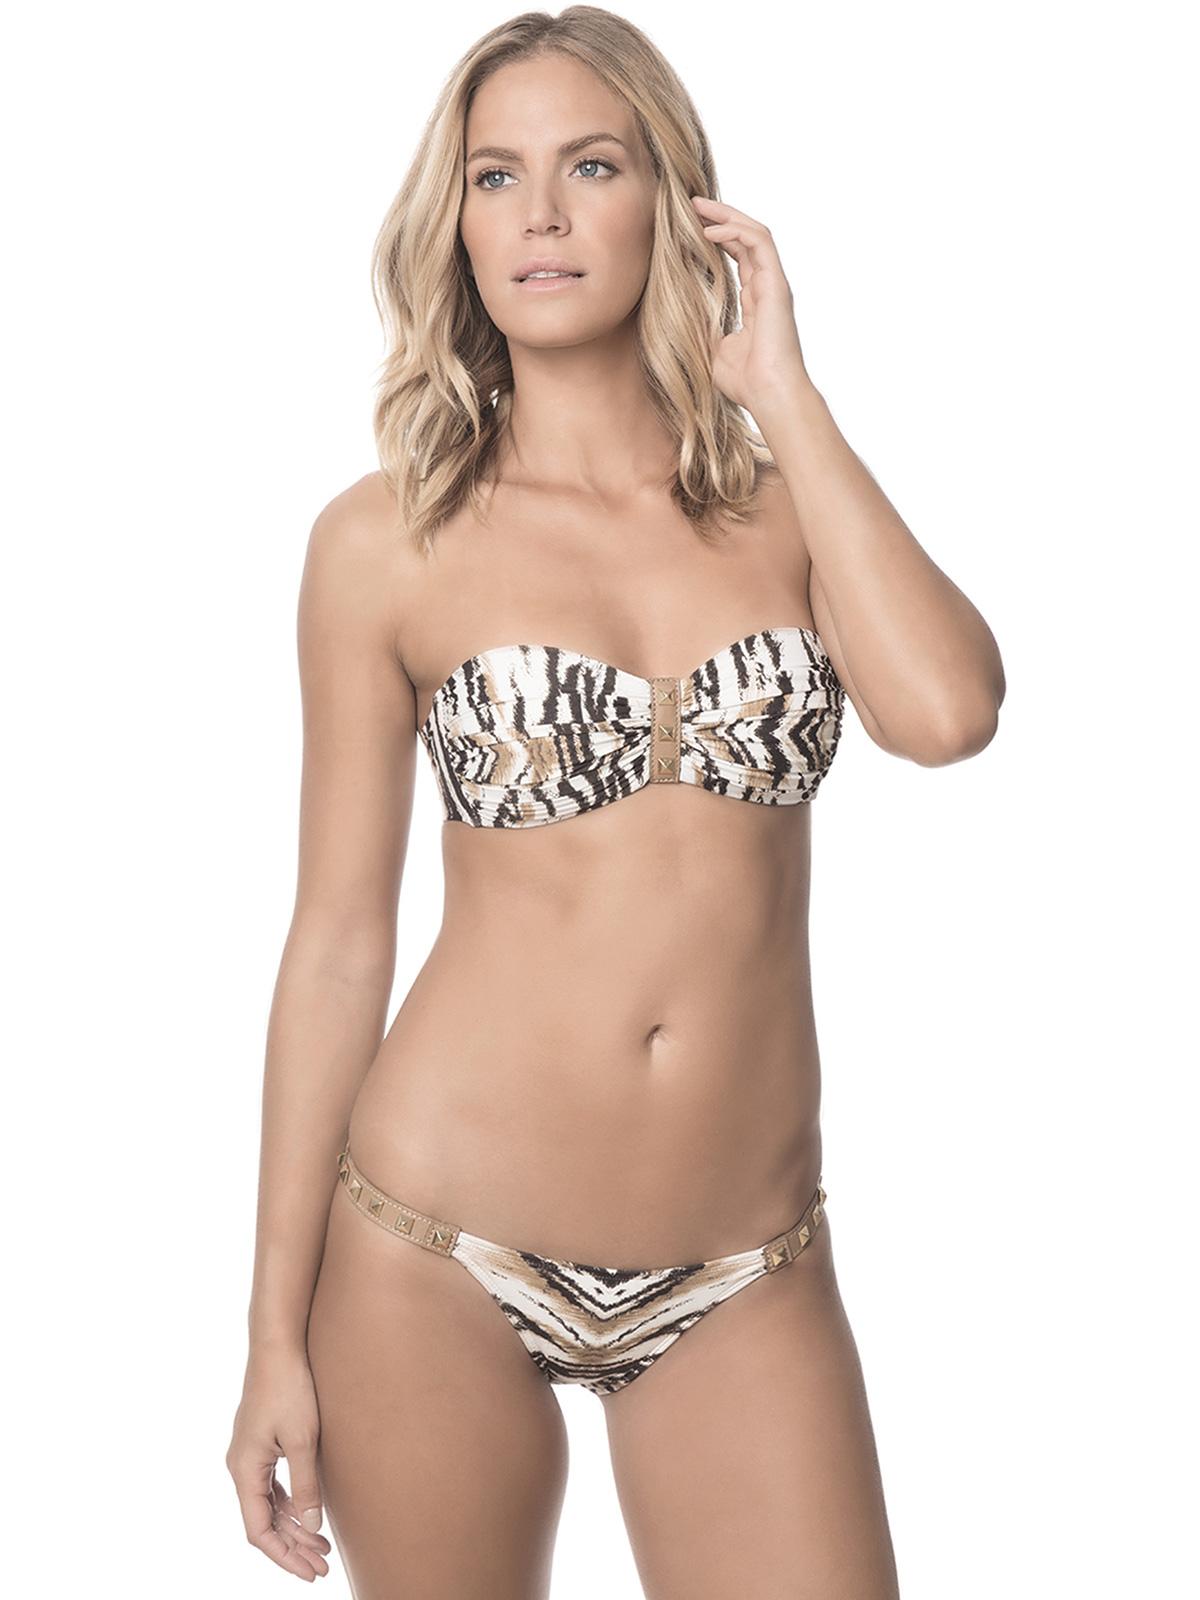 bandeau bikini mit tiermotiven leder und vergoldeten. Black Bedroom Furniture Sets. Home Design Ideas